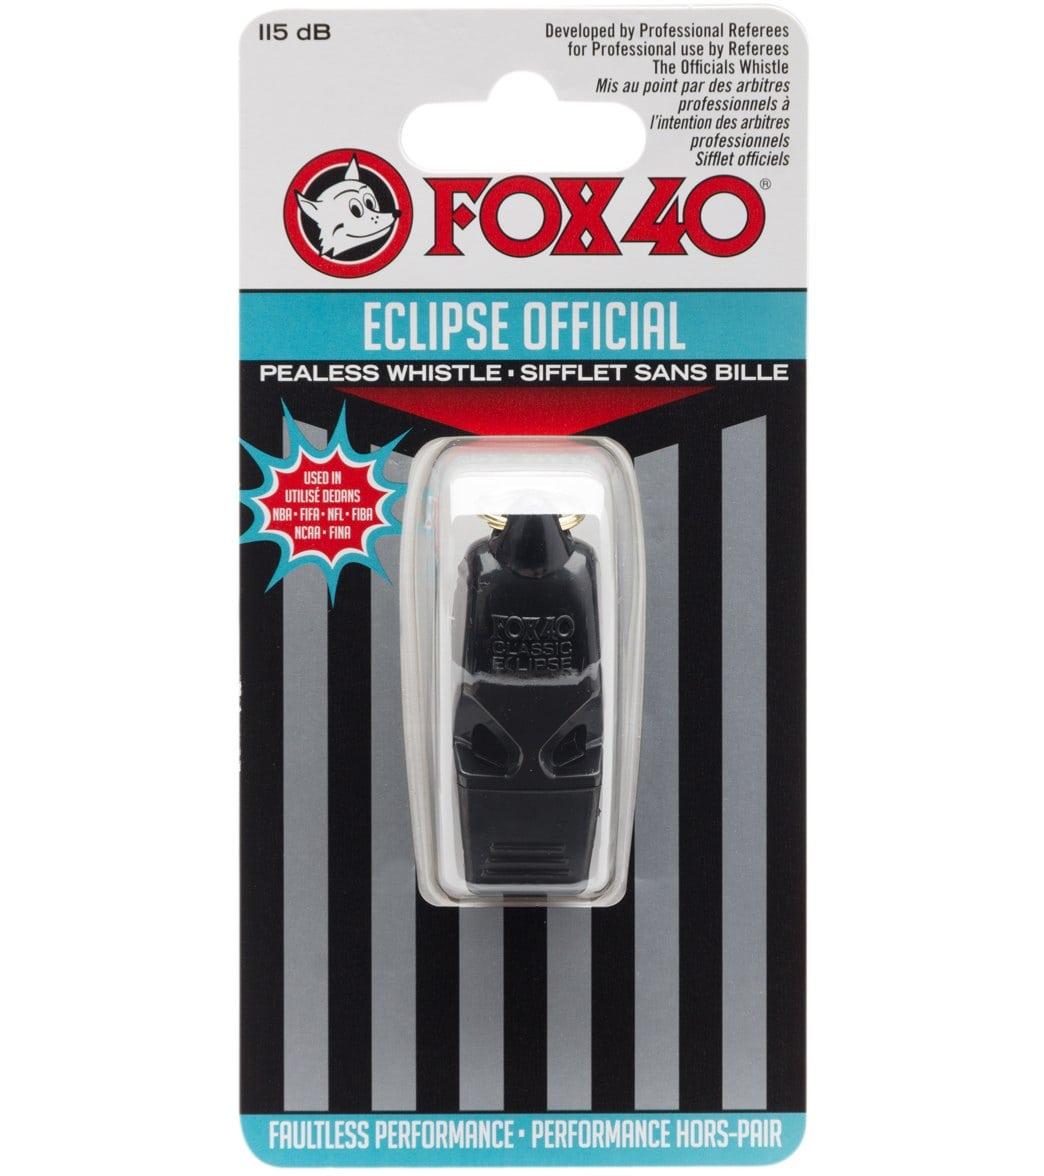 feeb2564f975 Fox 40 Classic Eclipse Lifeguard Whistle at SwimOutlet.com